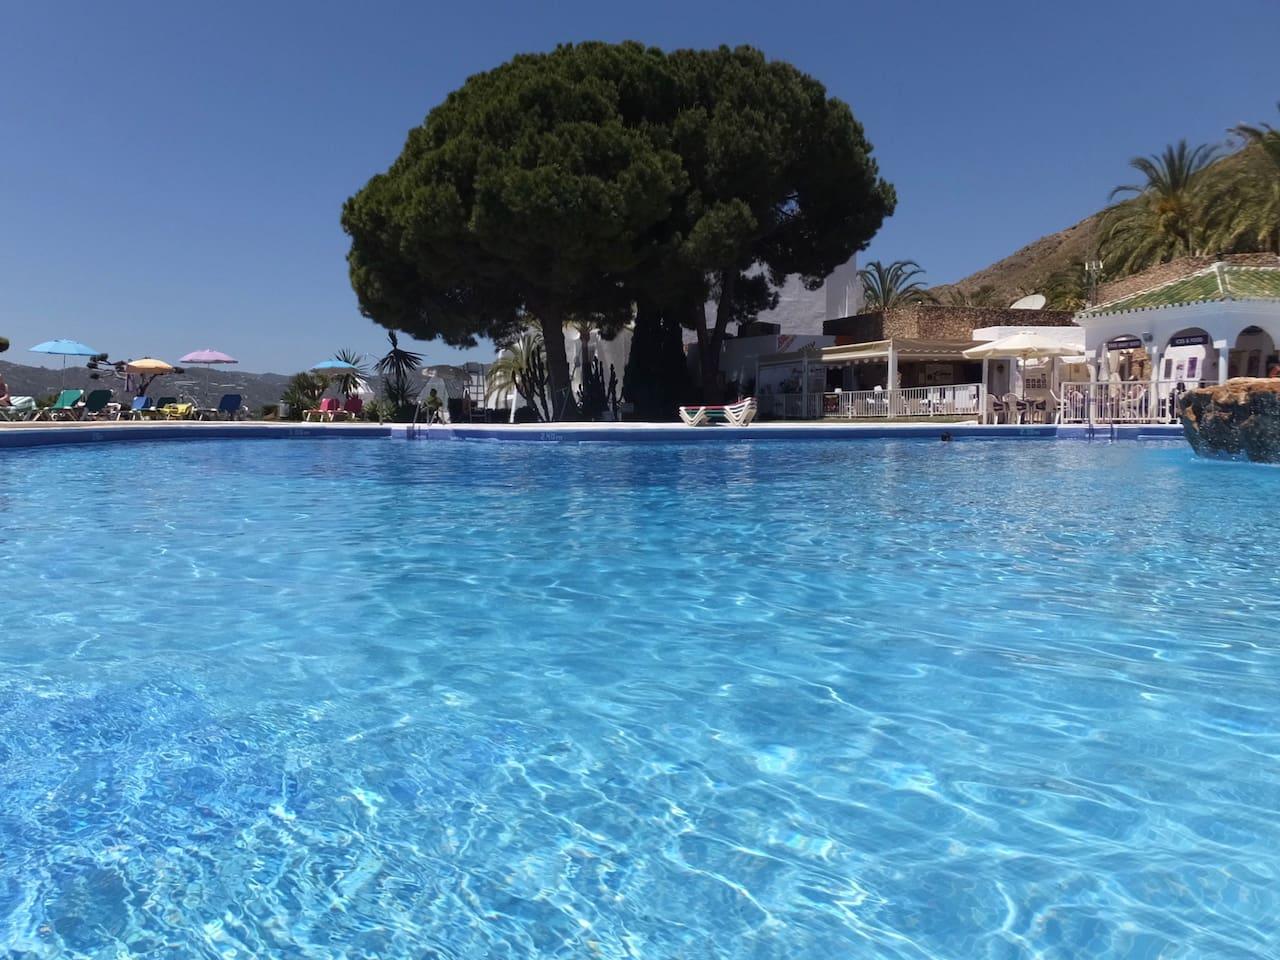 Pool with pool bar/restaurant